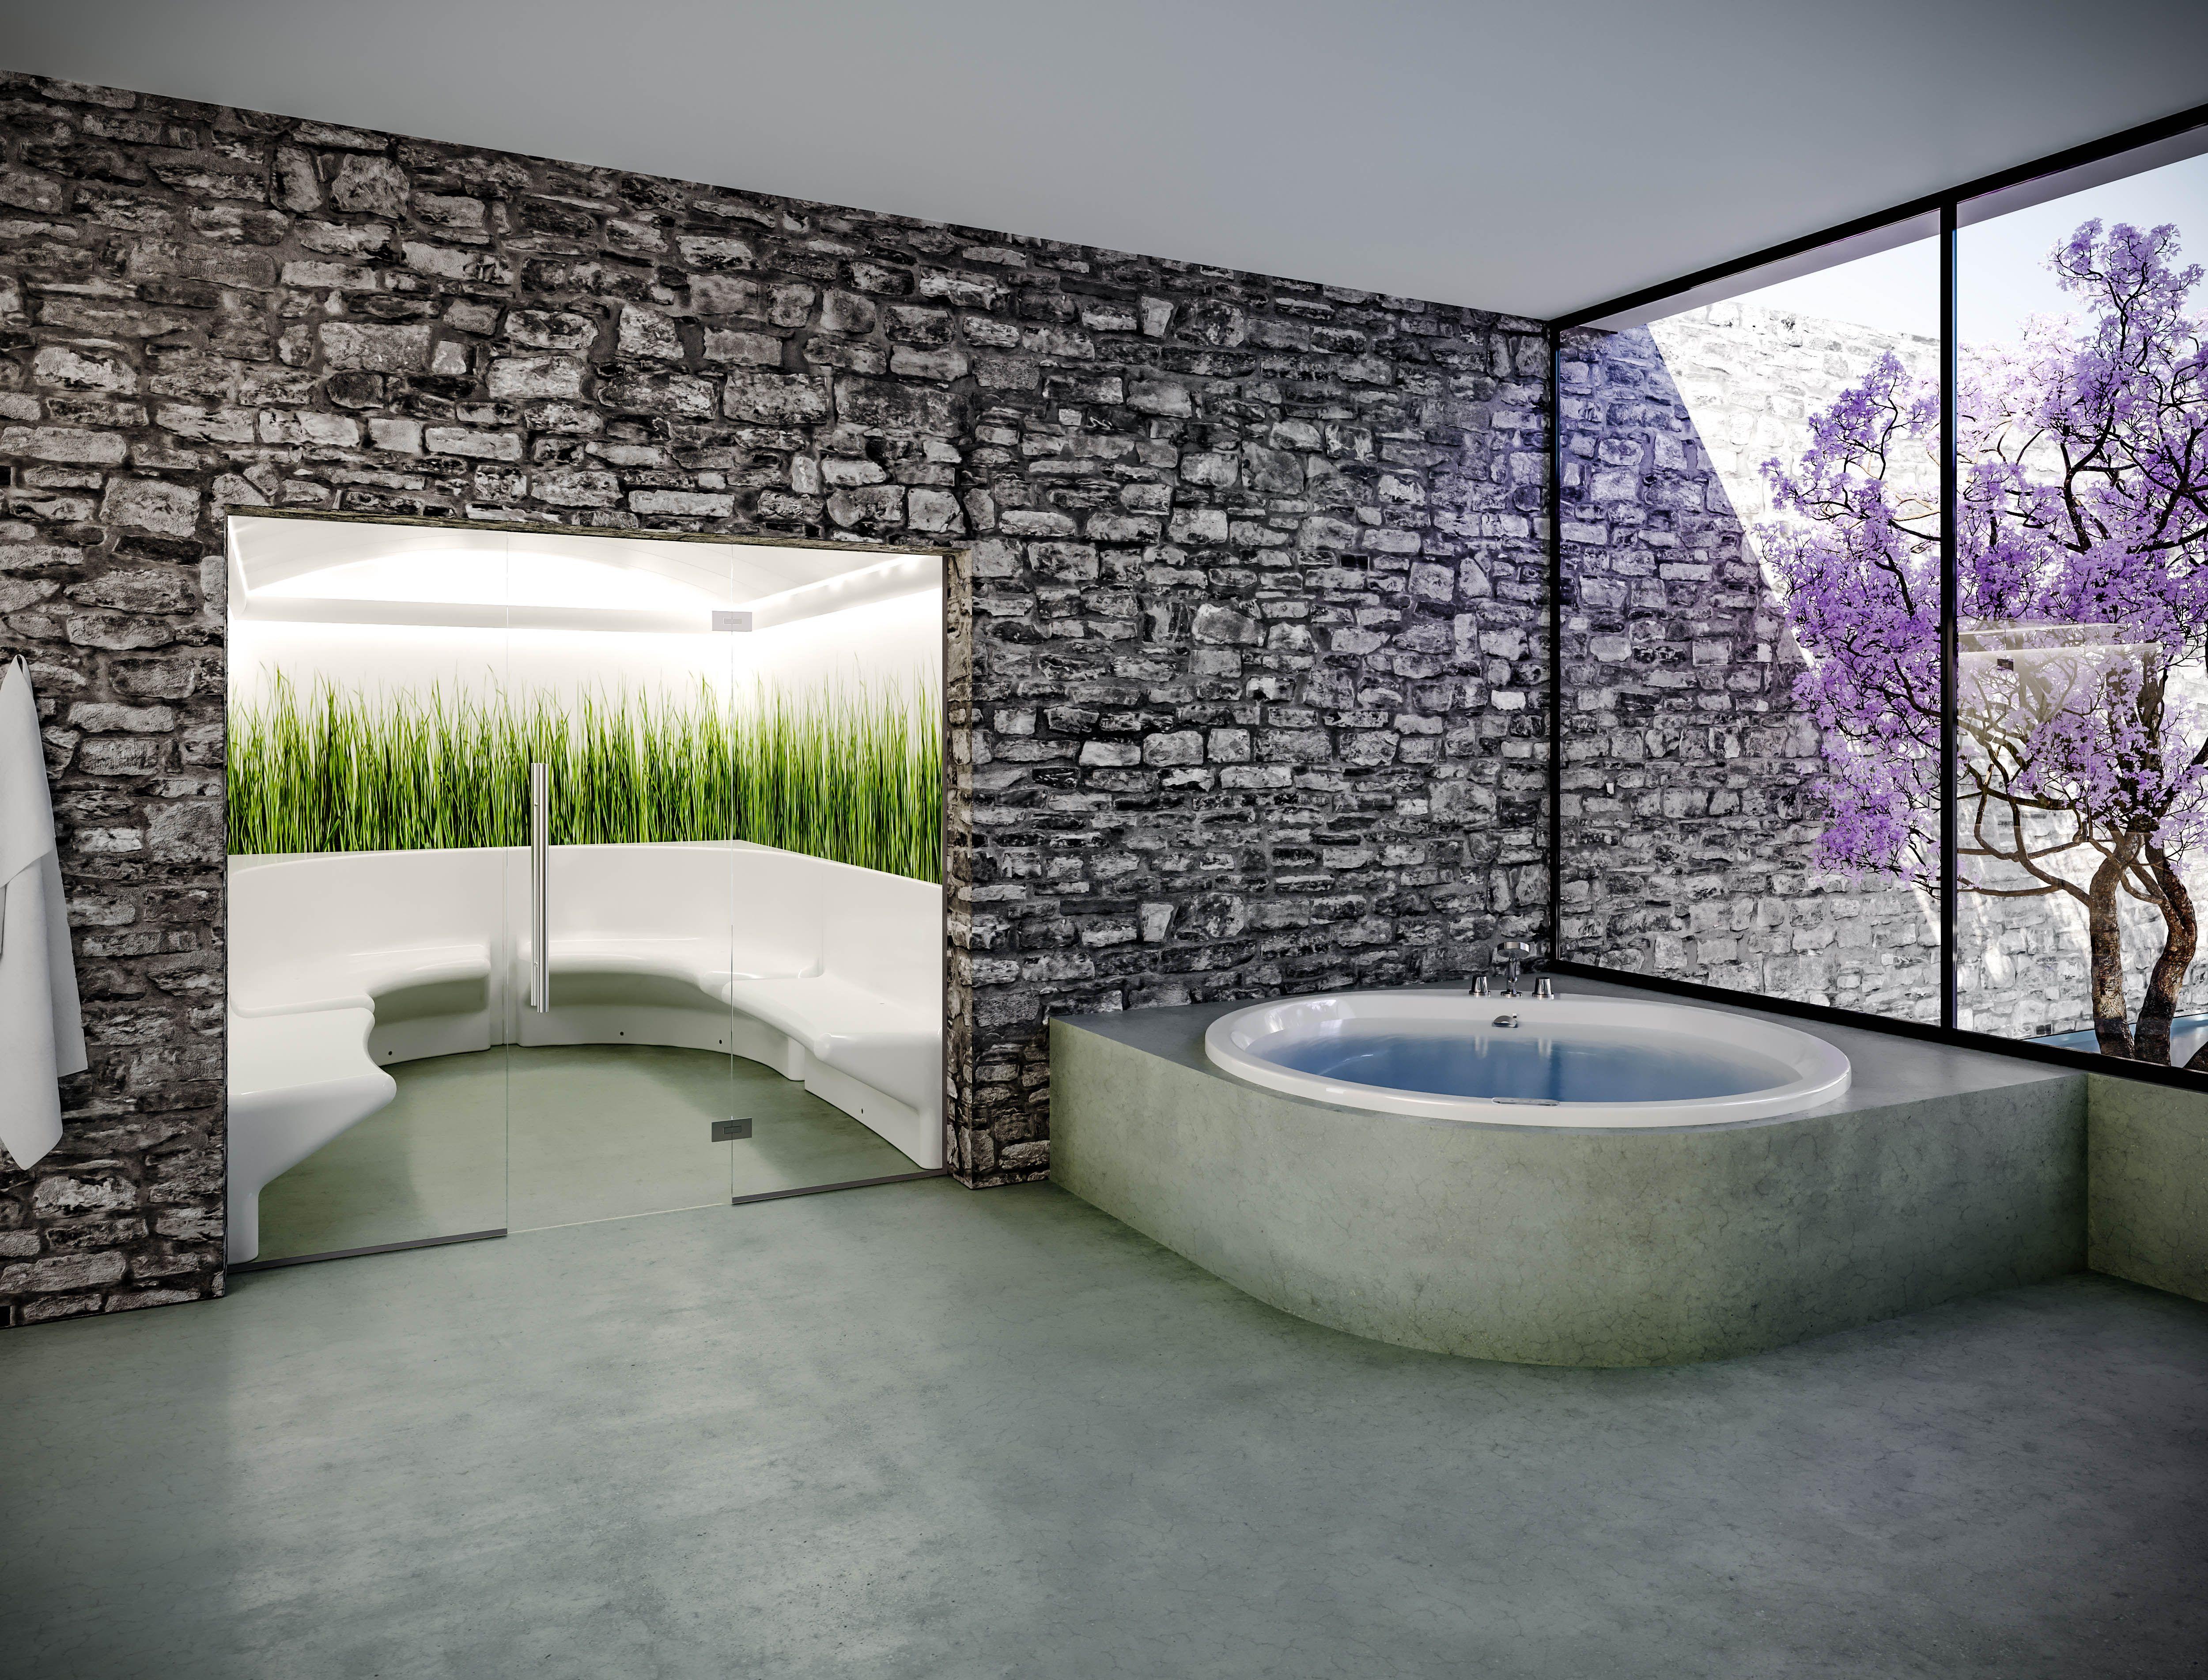 Cleopatra hoekbad rond nieuw 2018 sanidrome badkamer | 1. Hoekbad ...